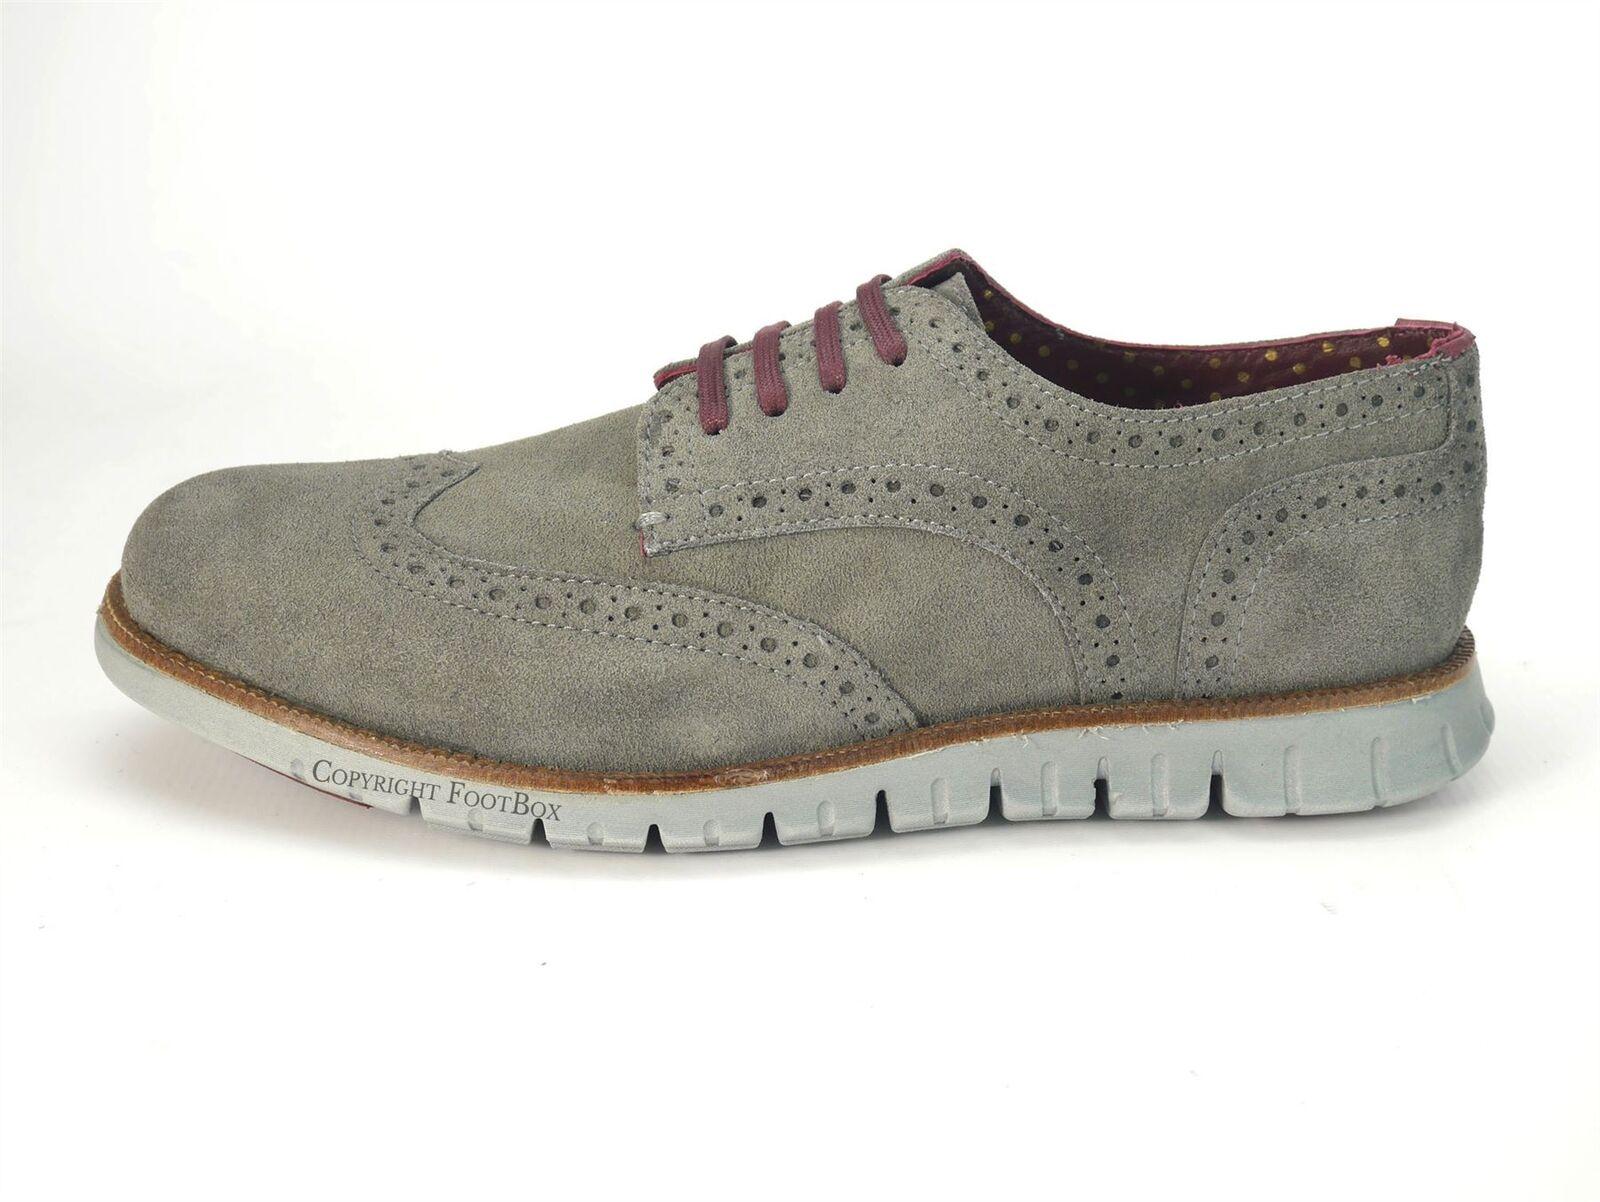 Chaussures Gatz Homme Daim Chaussures décontractées Derby Léger Léger Léger Chaussures Gris | Beau  | Moins Cher  480f28